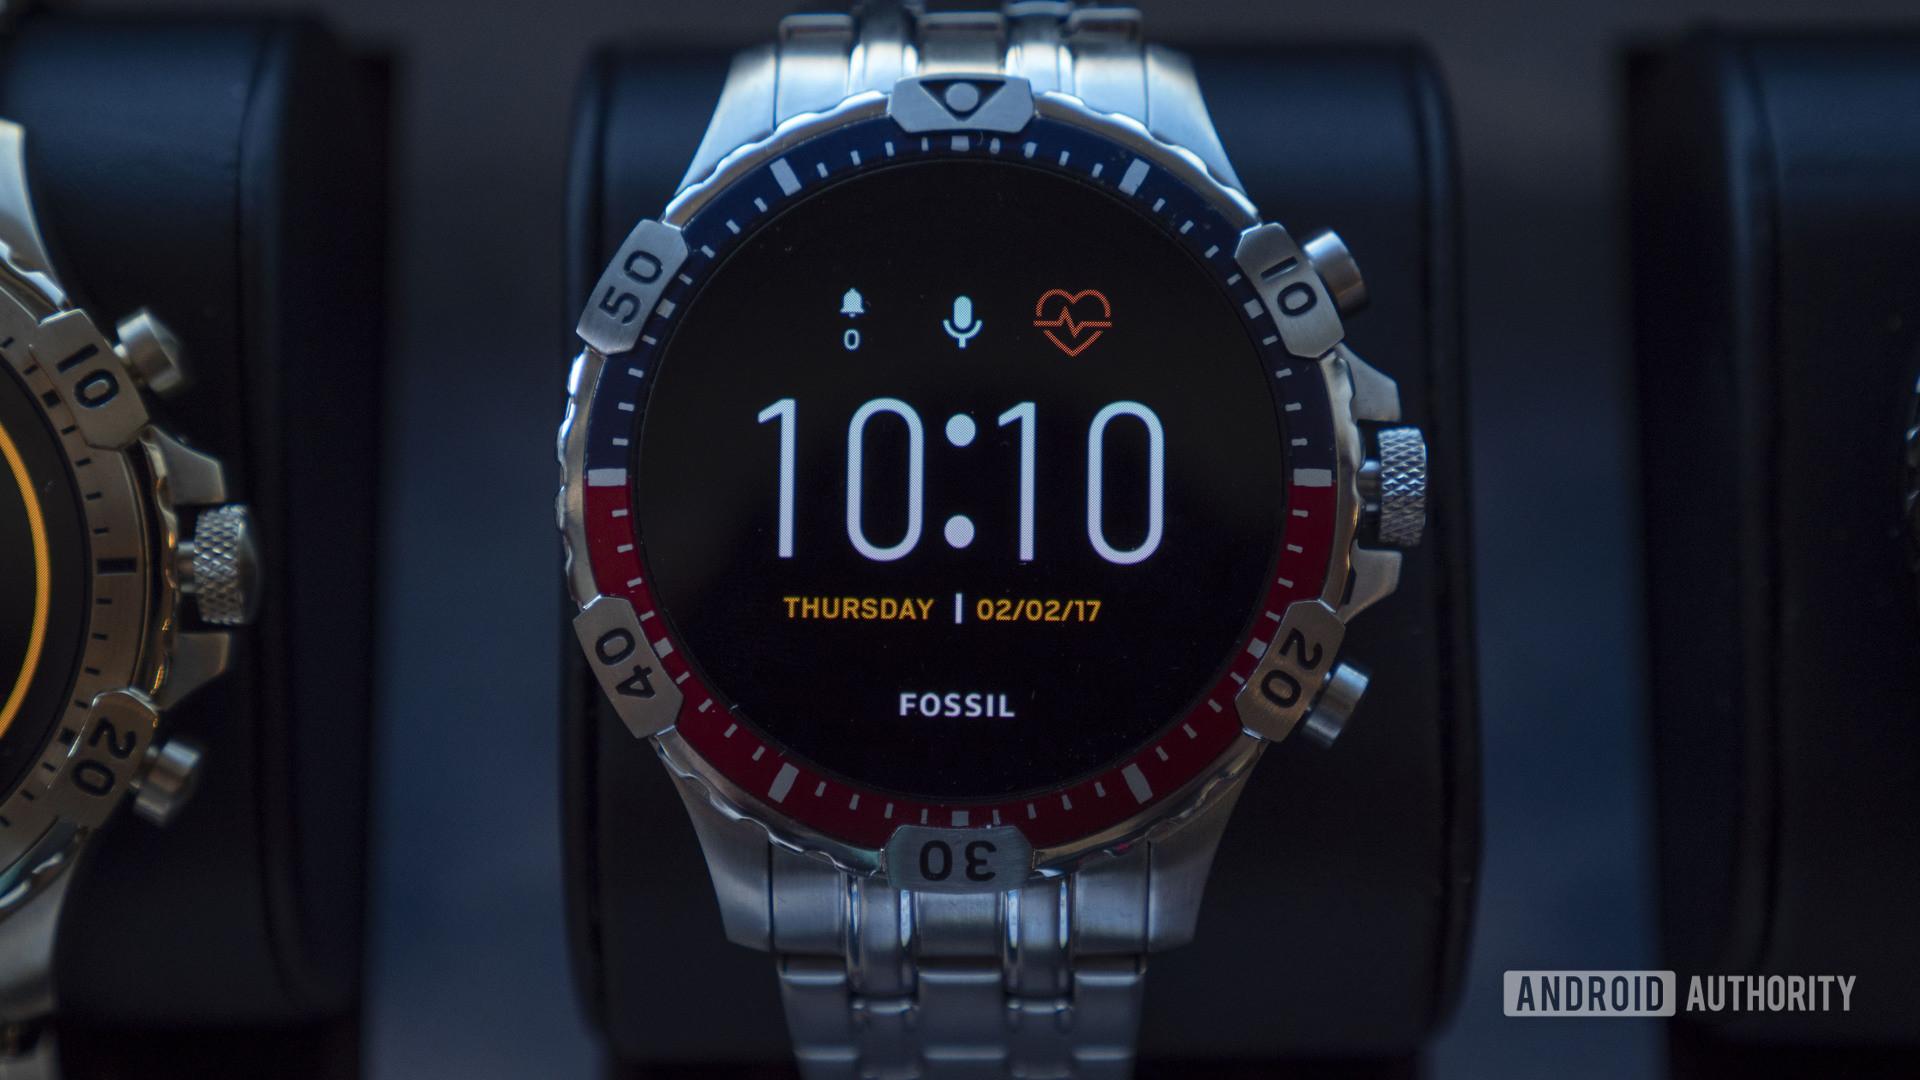 fossil gen 5 smartwatch garrett 2